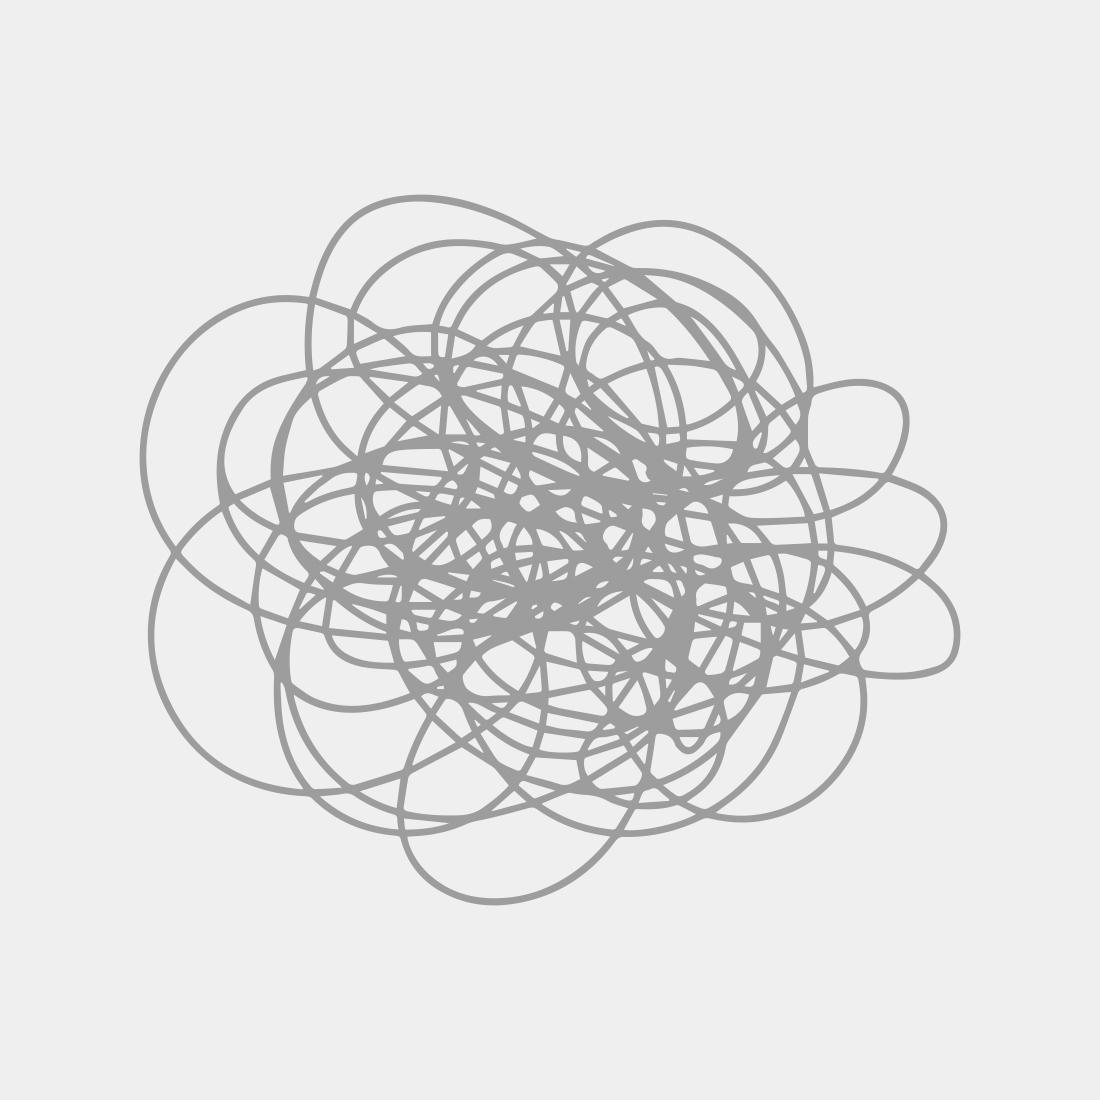 Collections Gallery Postcard John Francis Rigaud RA (1742-1810) Samson and Delilah, c. 1784